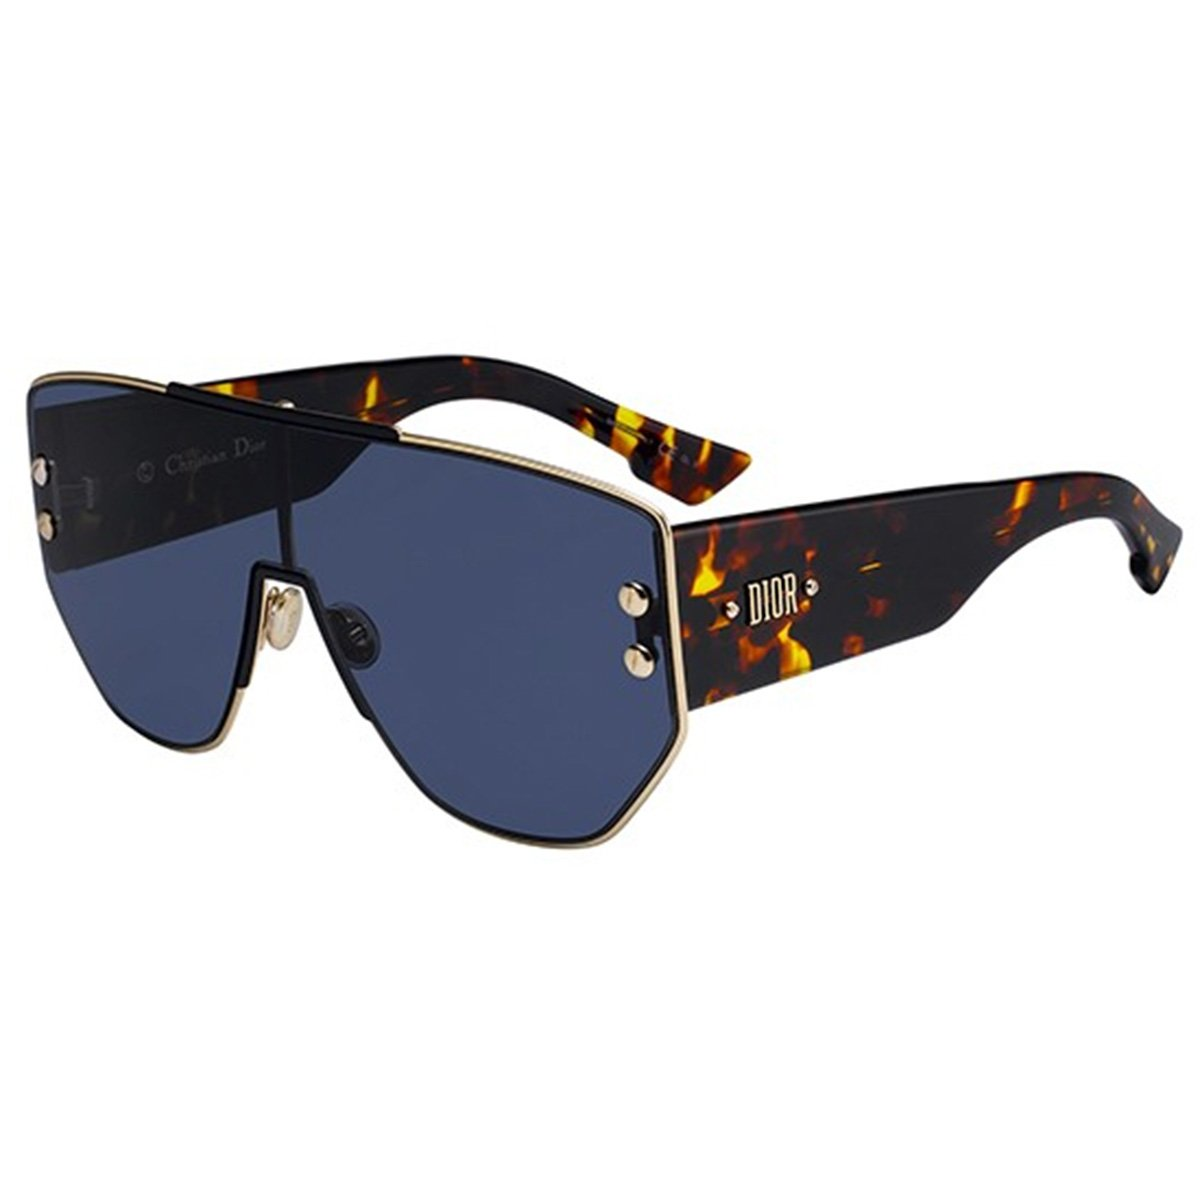 Compre Óculos de Sol Dior Addict 1 em 10X   Tri-Jóia Shop c450f91536